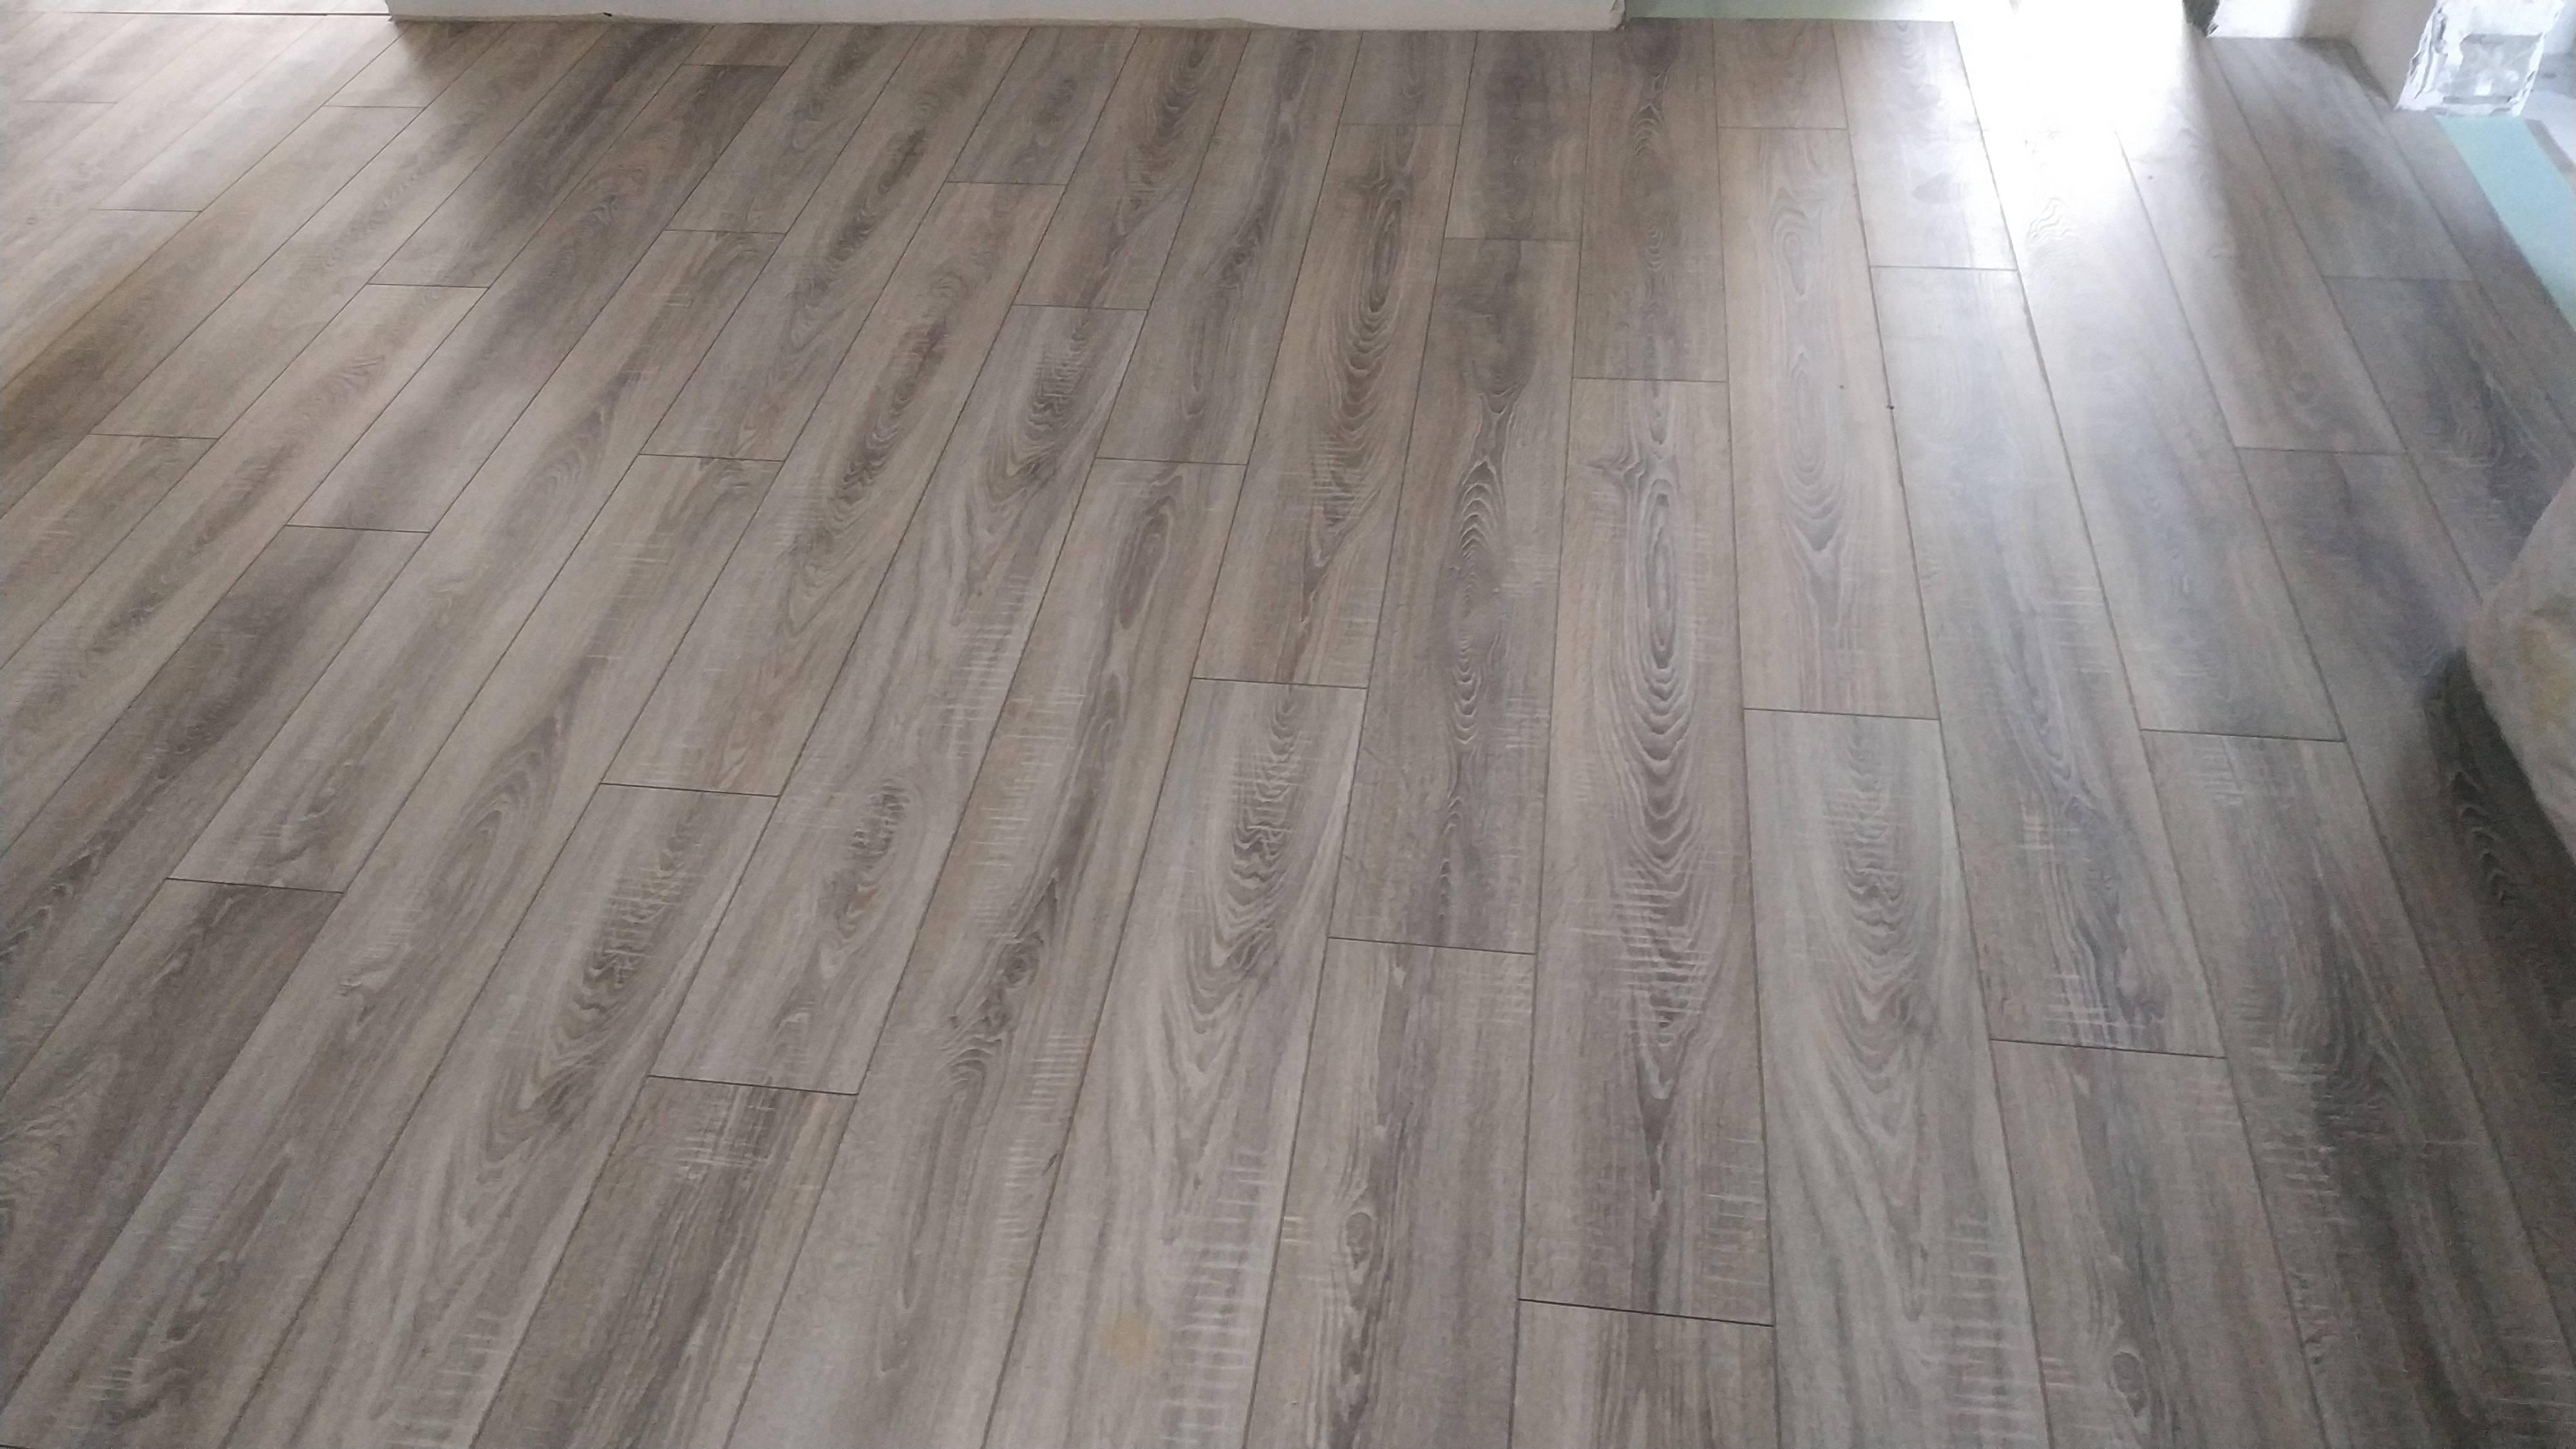 Укладка Ламината Egger PRO Laminate Flooring 8мм-Classic 4V EPL036 Дуб Бардолино серый 32 класс с фаской